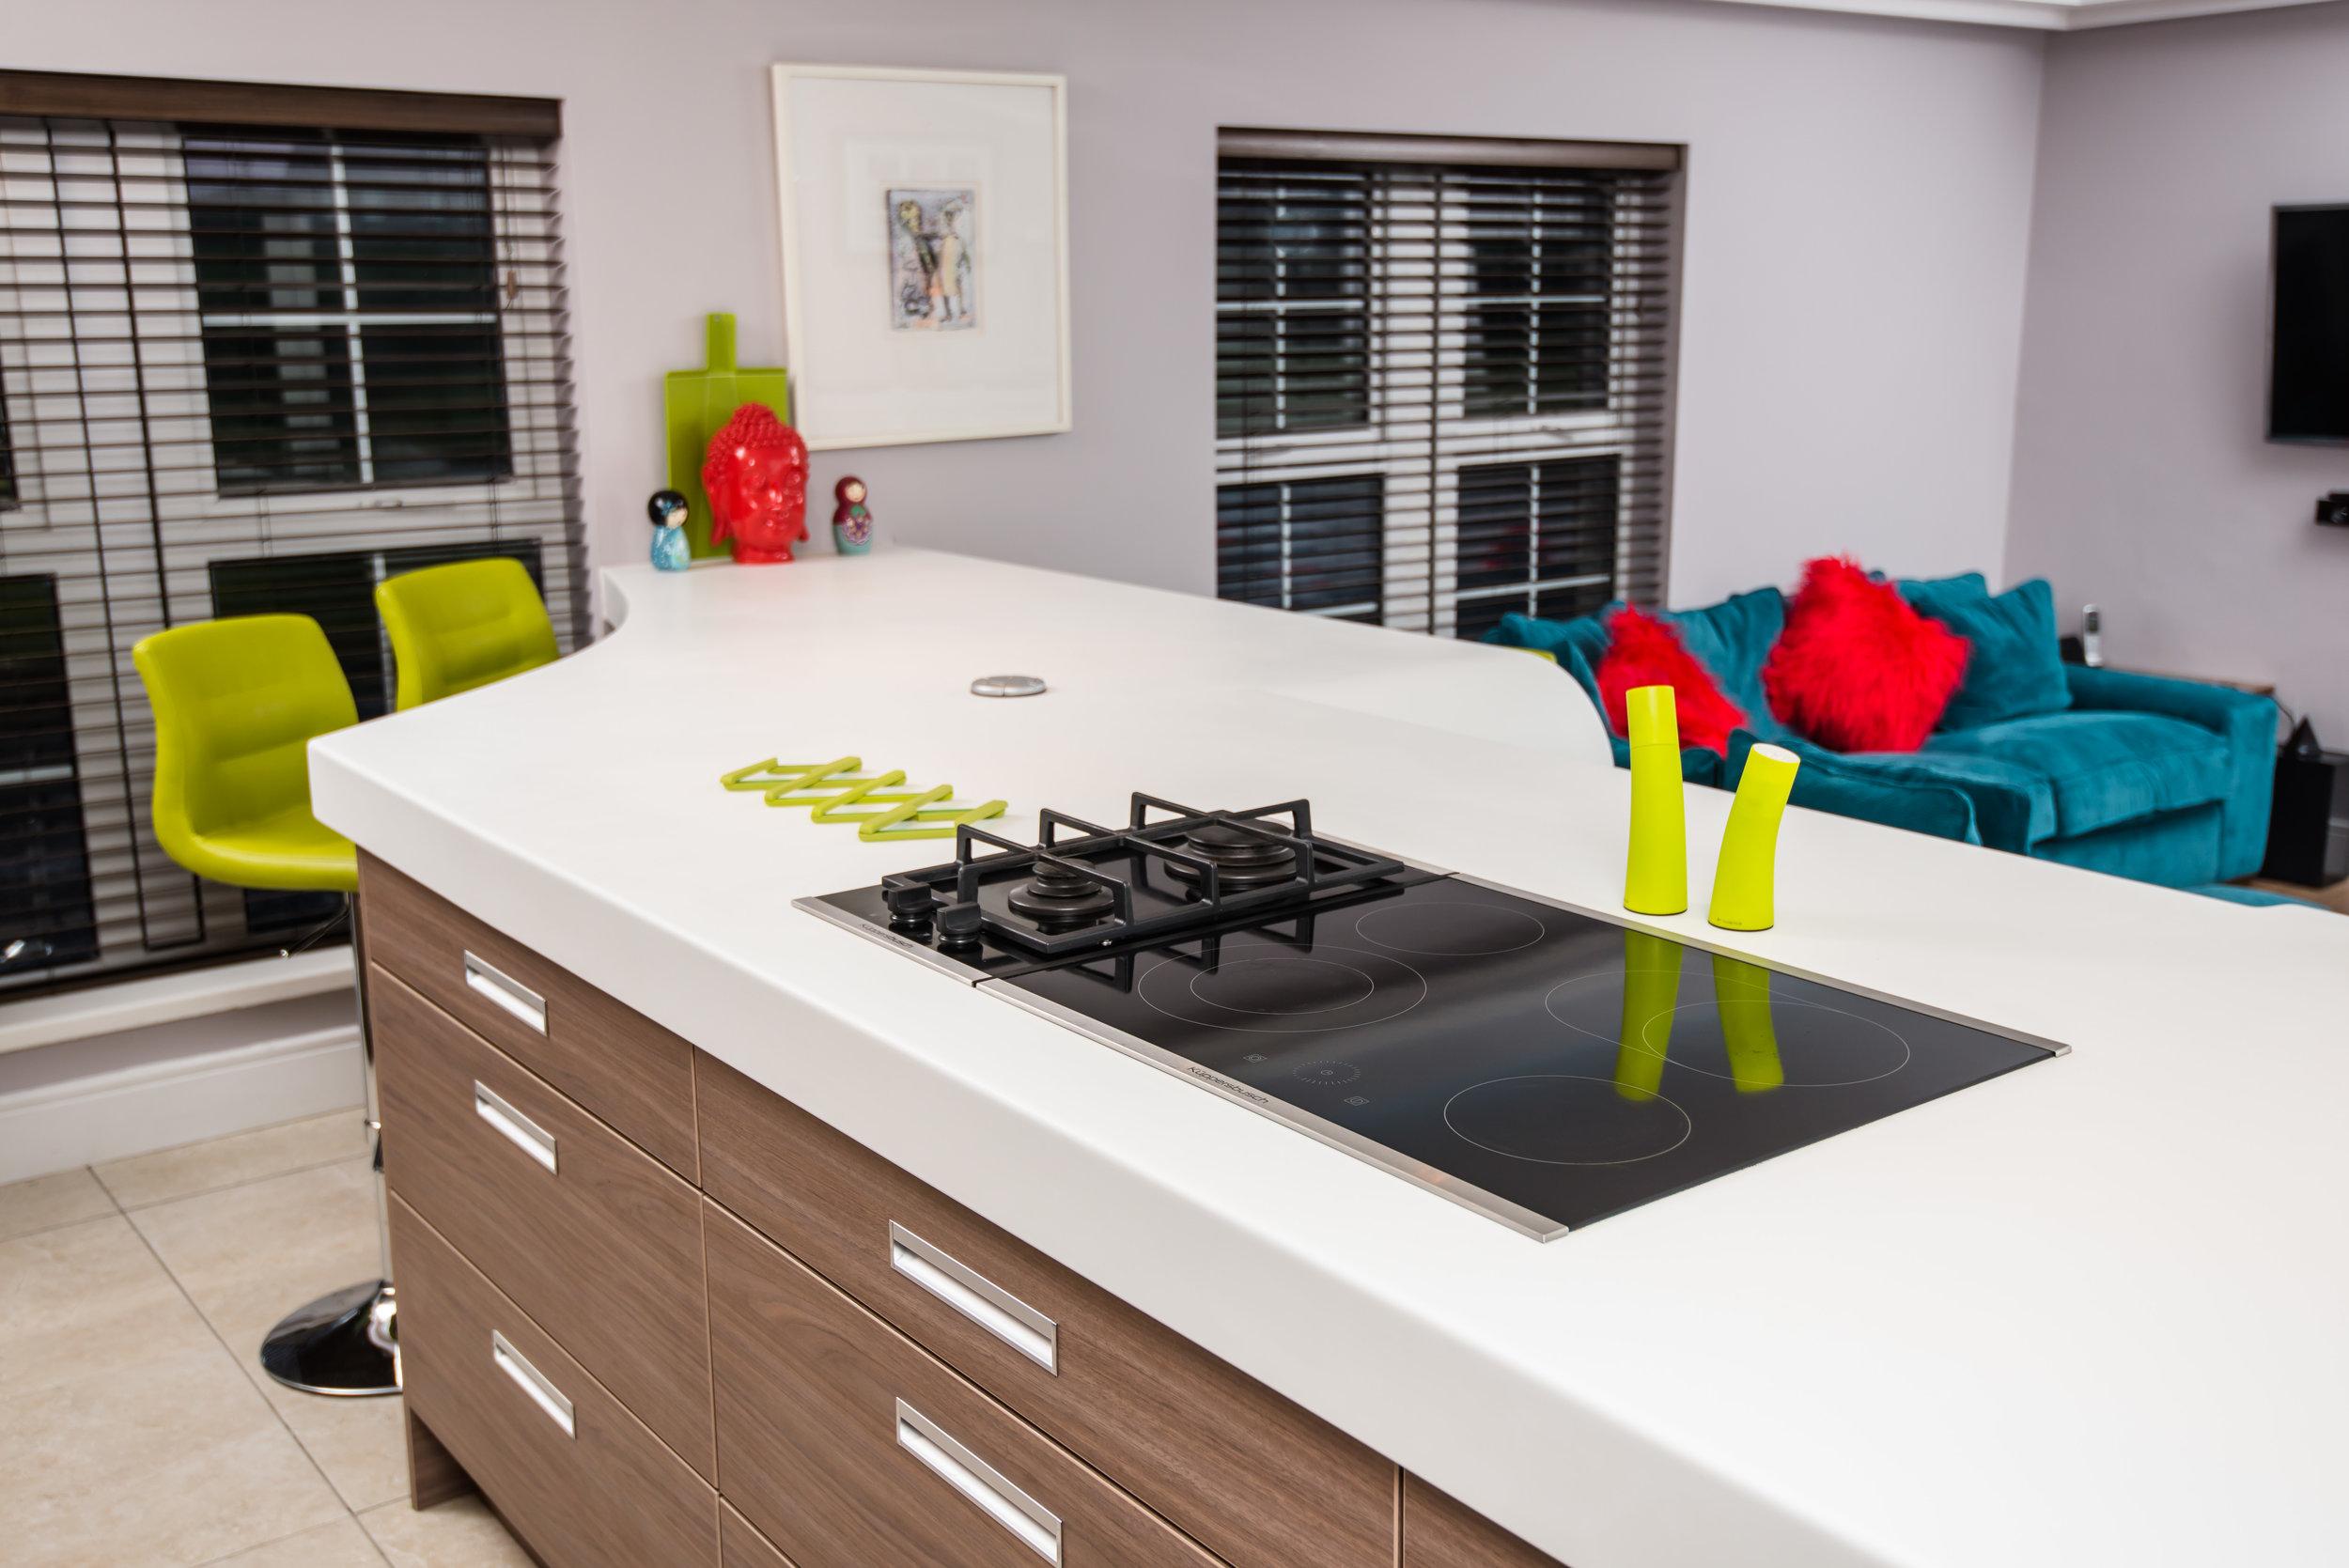 PH -003 -Corian kitchen.JPG